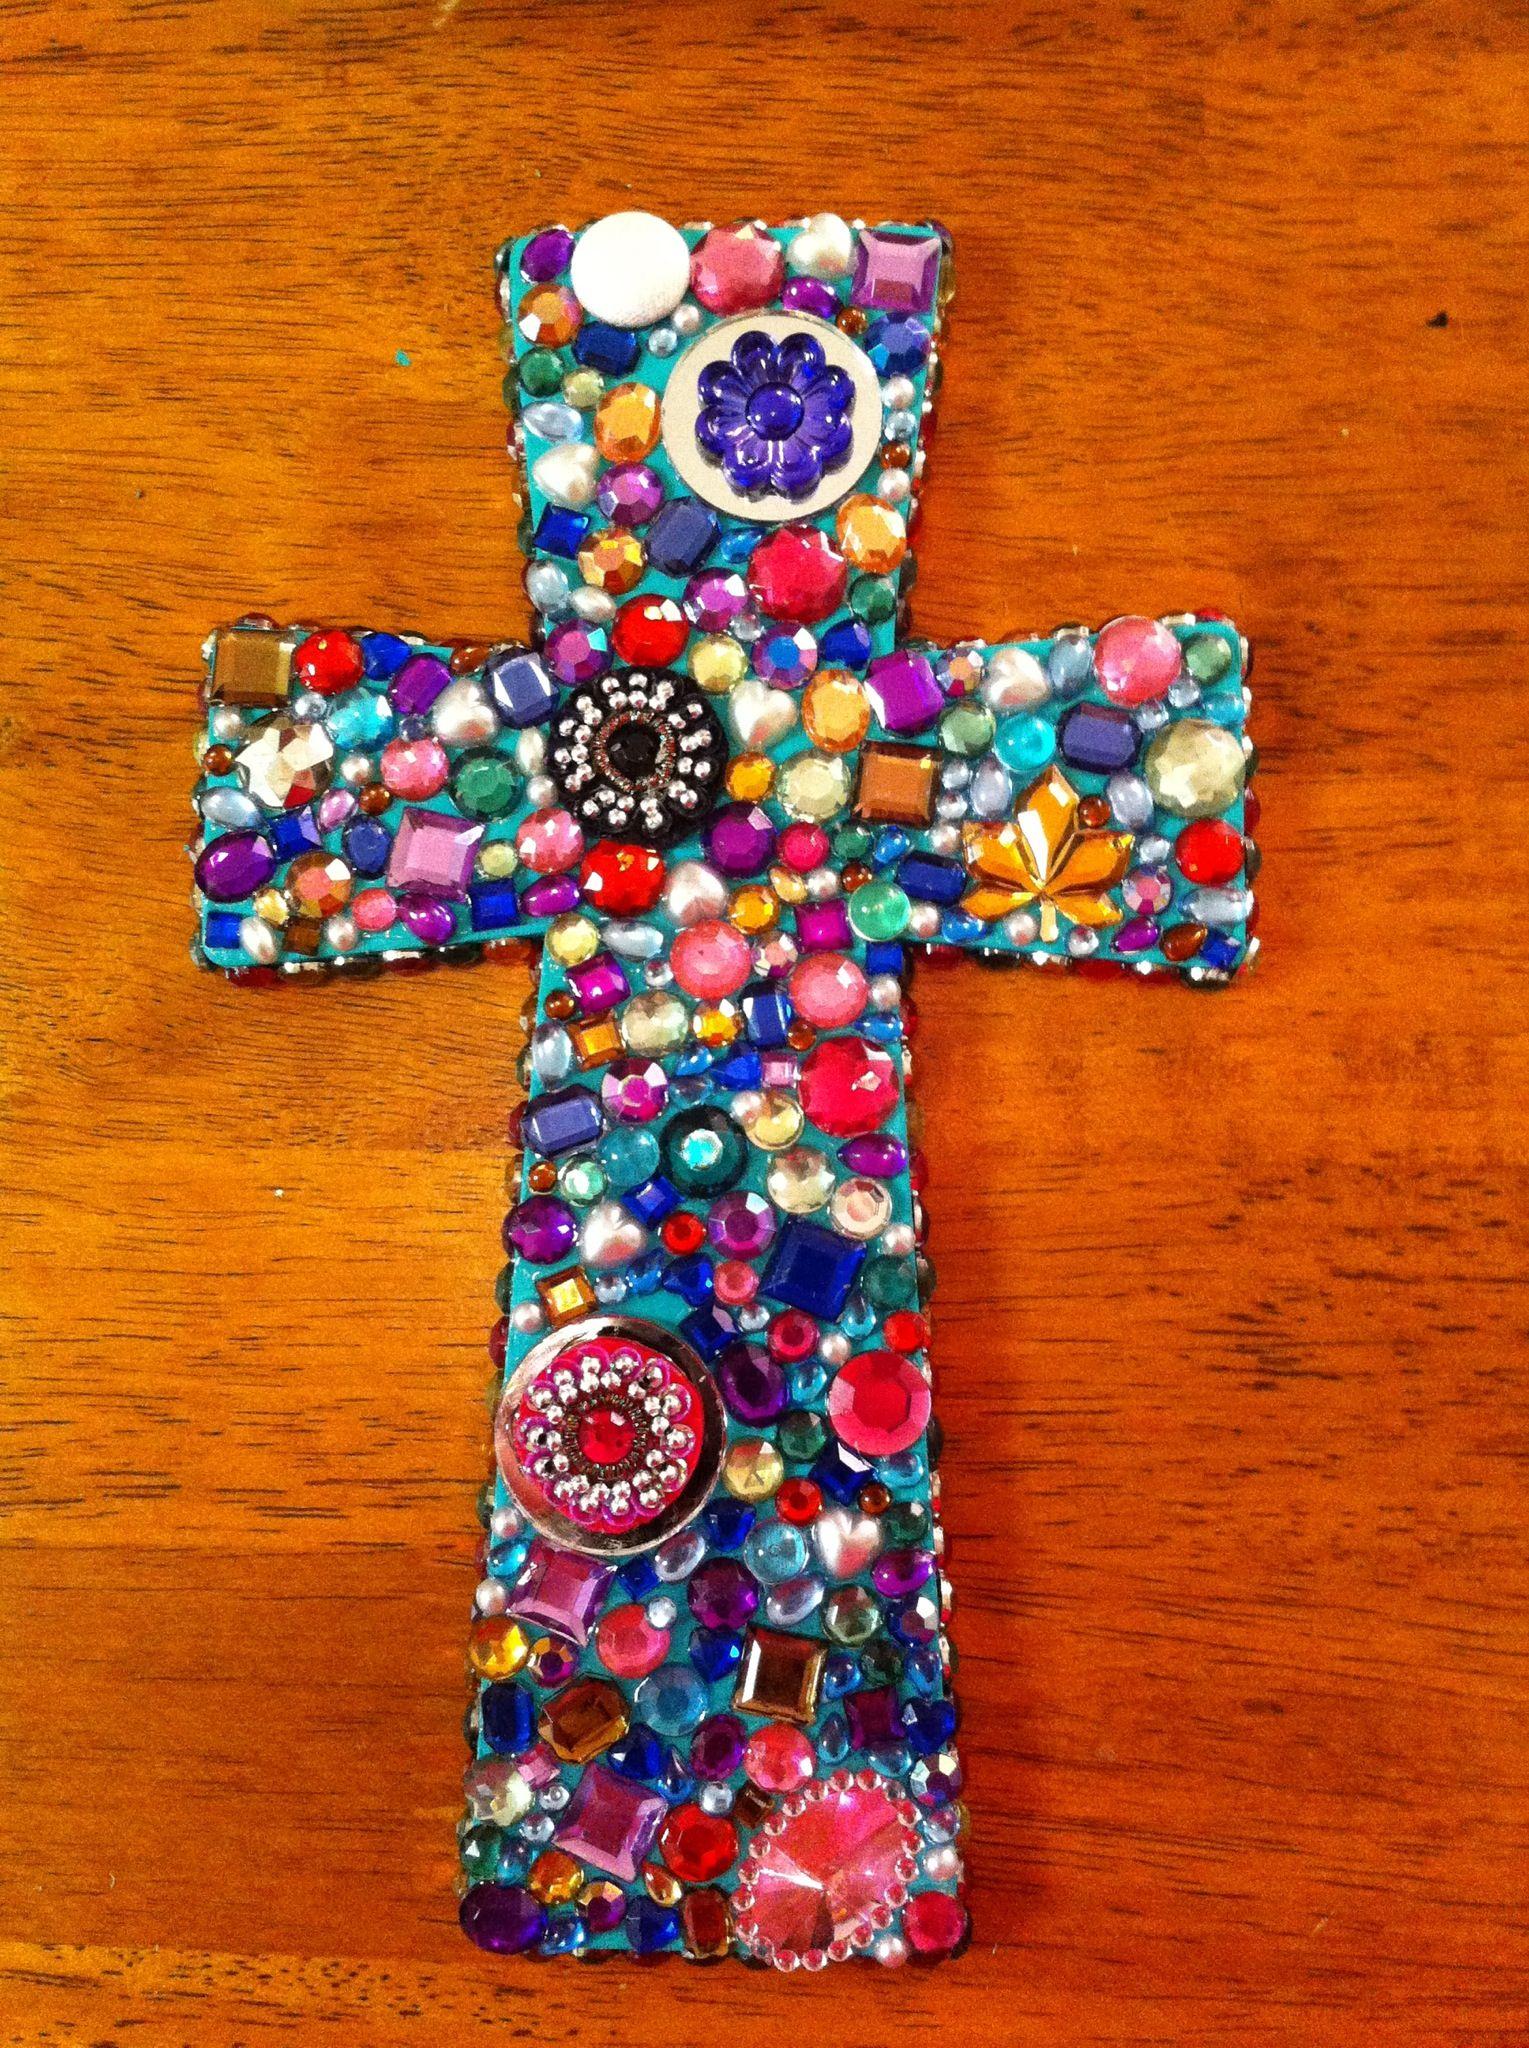 Besides cross clip art wall decor decorative wood cross decorative - Bejeweled Homemade Cross Wooden Crossesart